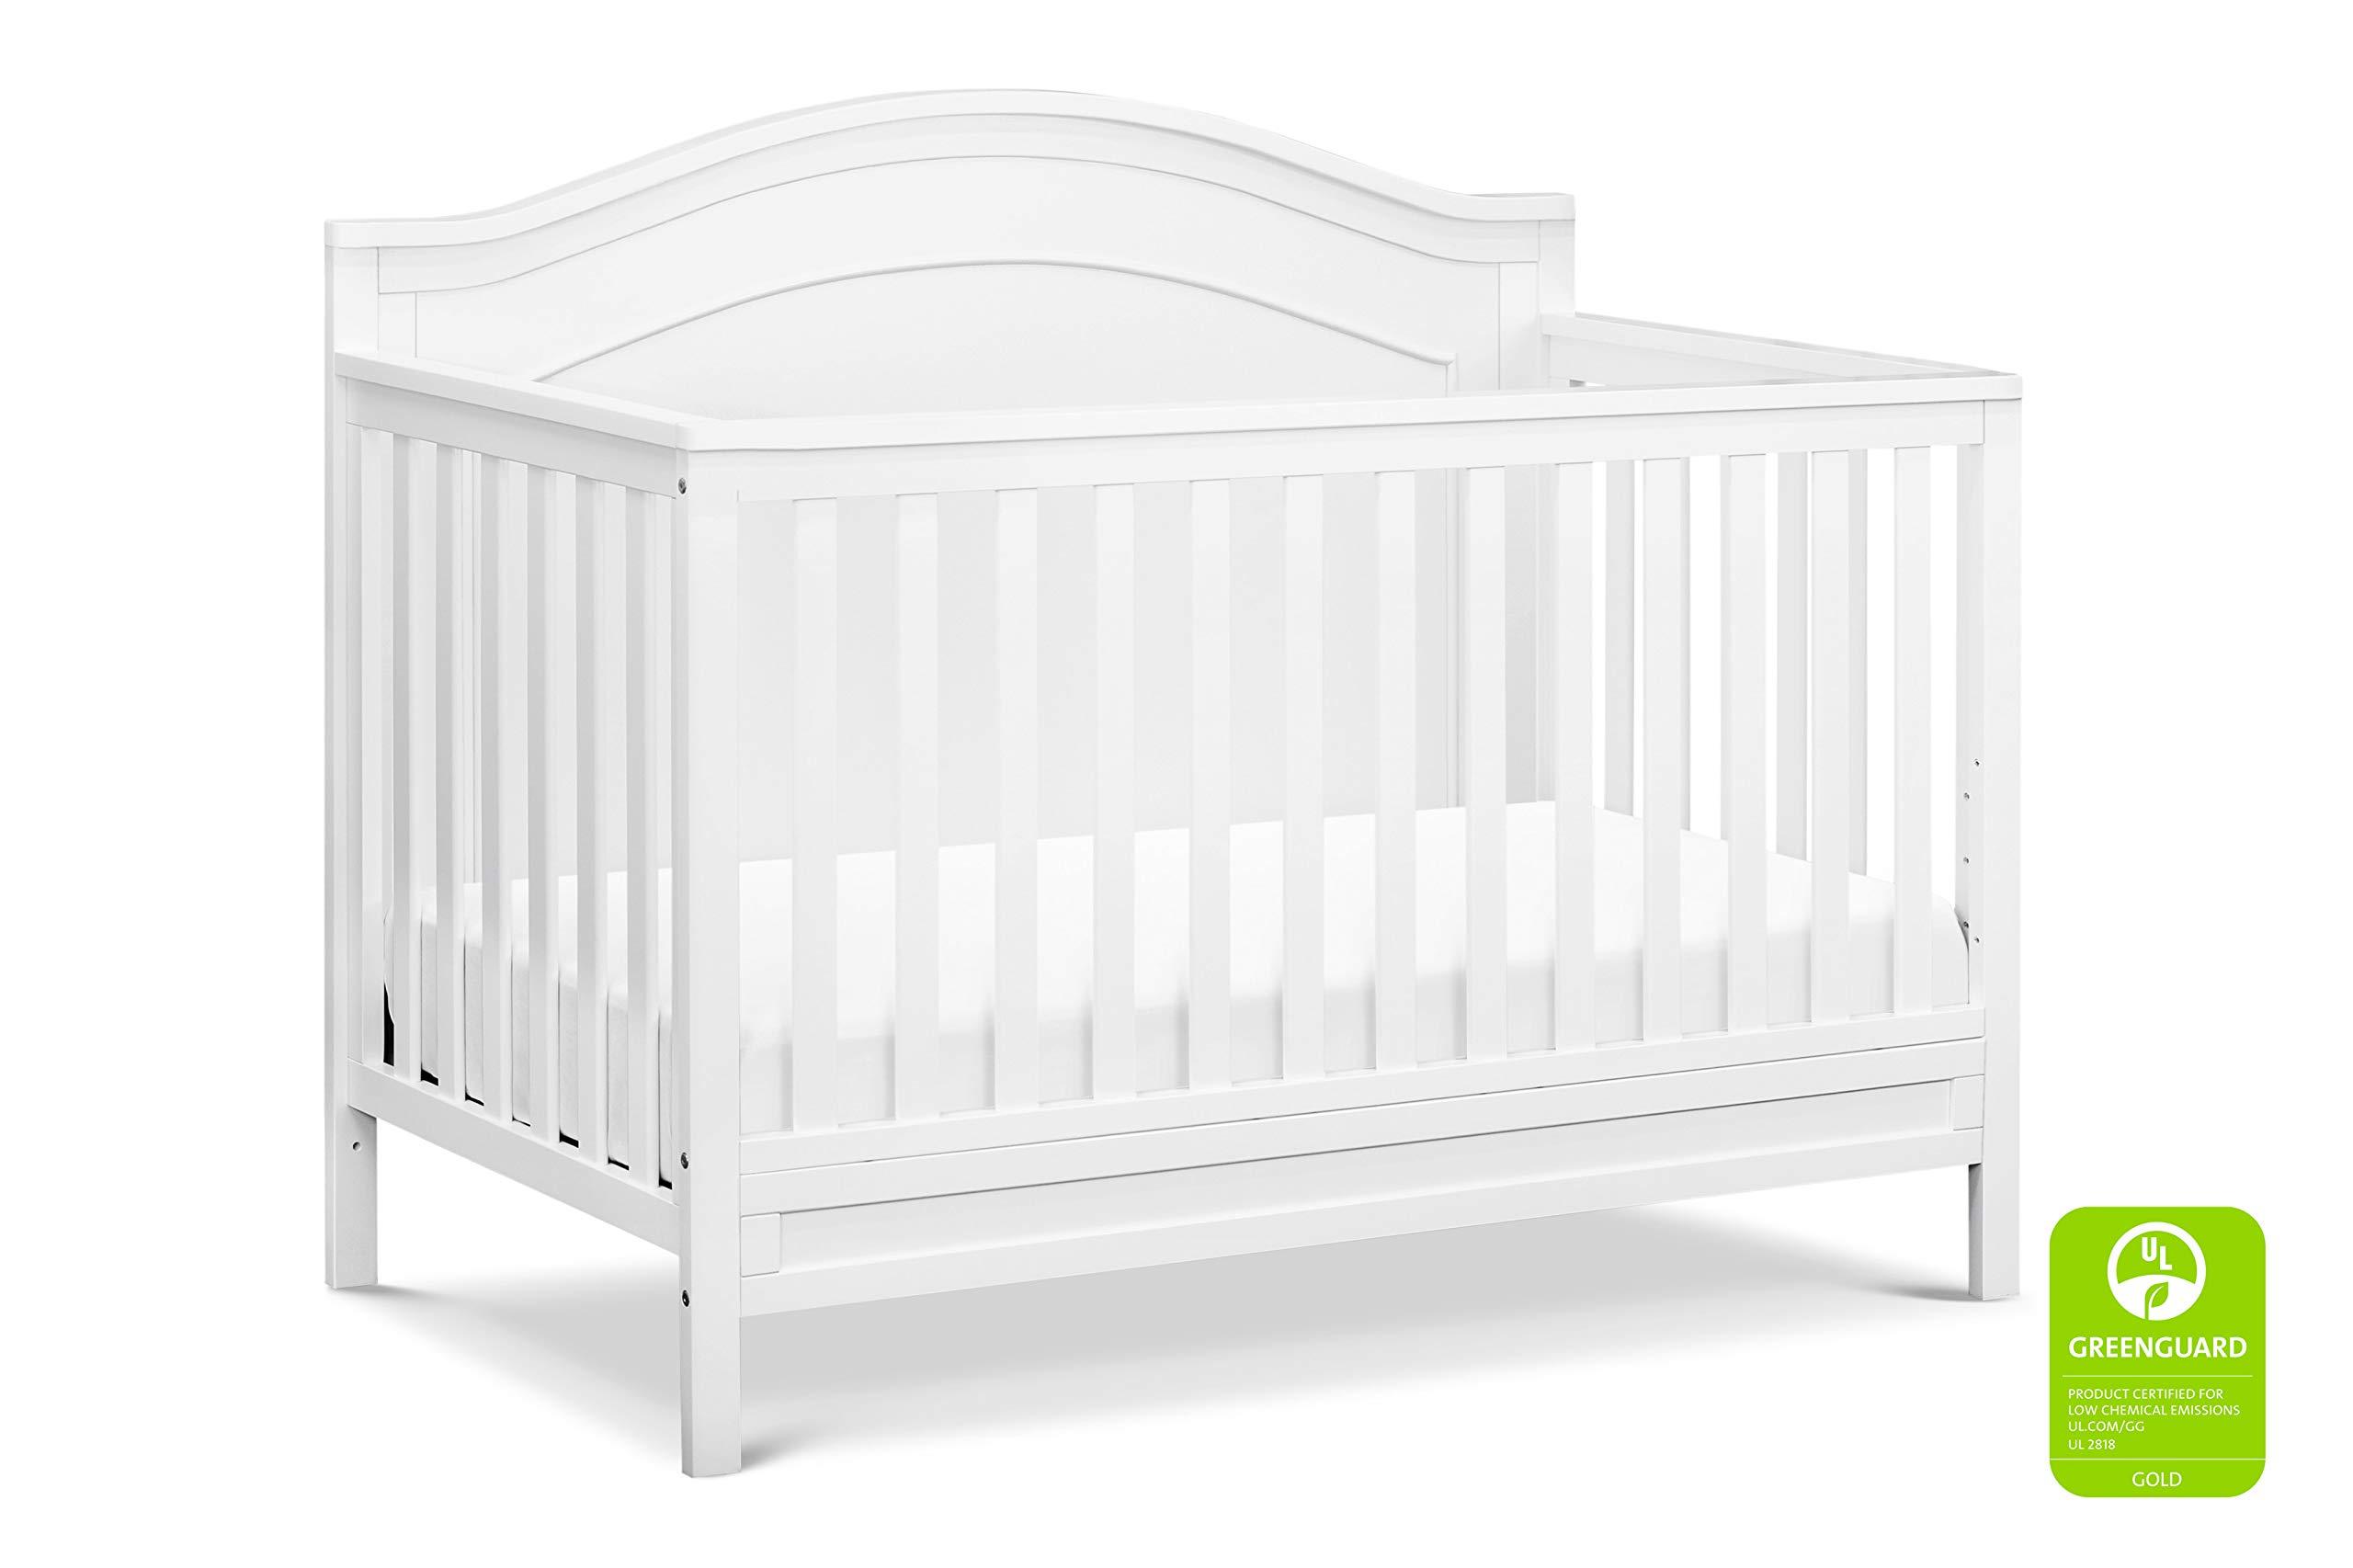 DaVinci Charlie 4-in-1 Convertible Crib, White by DaVinci